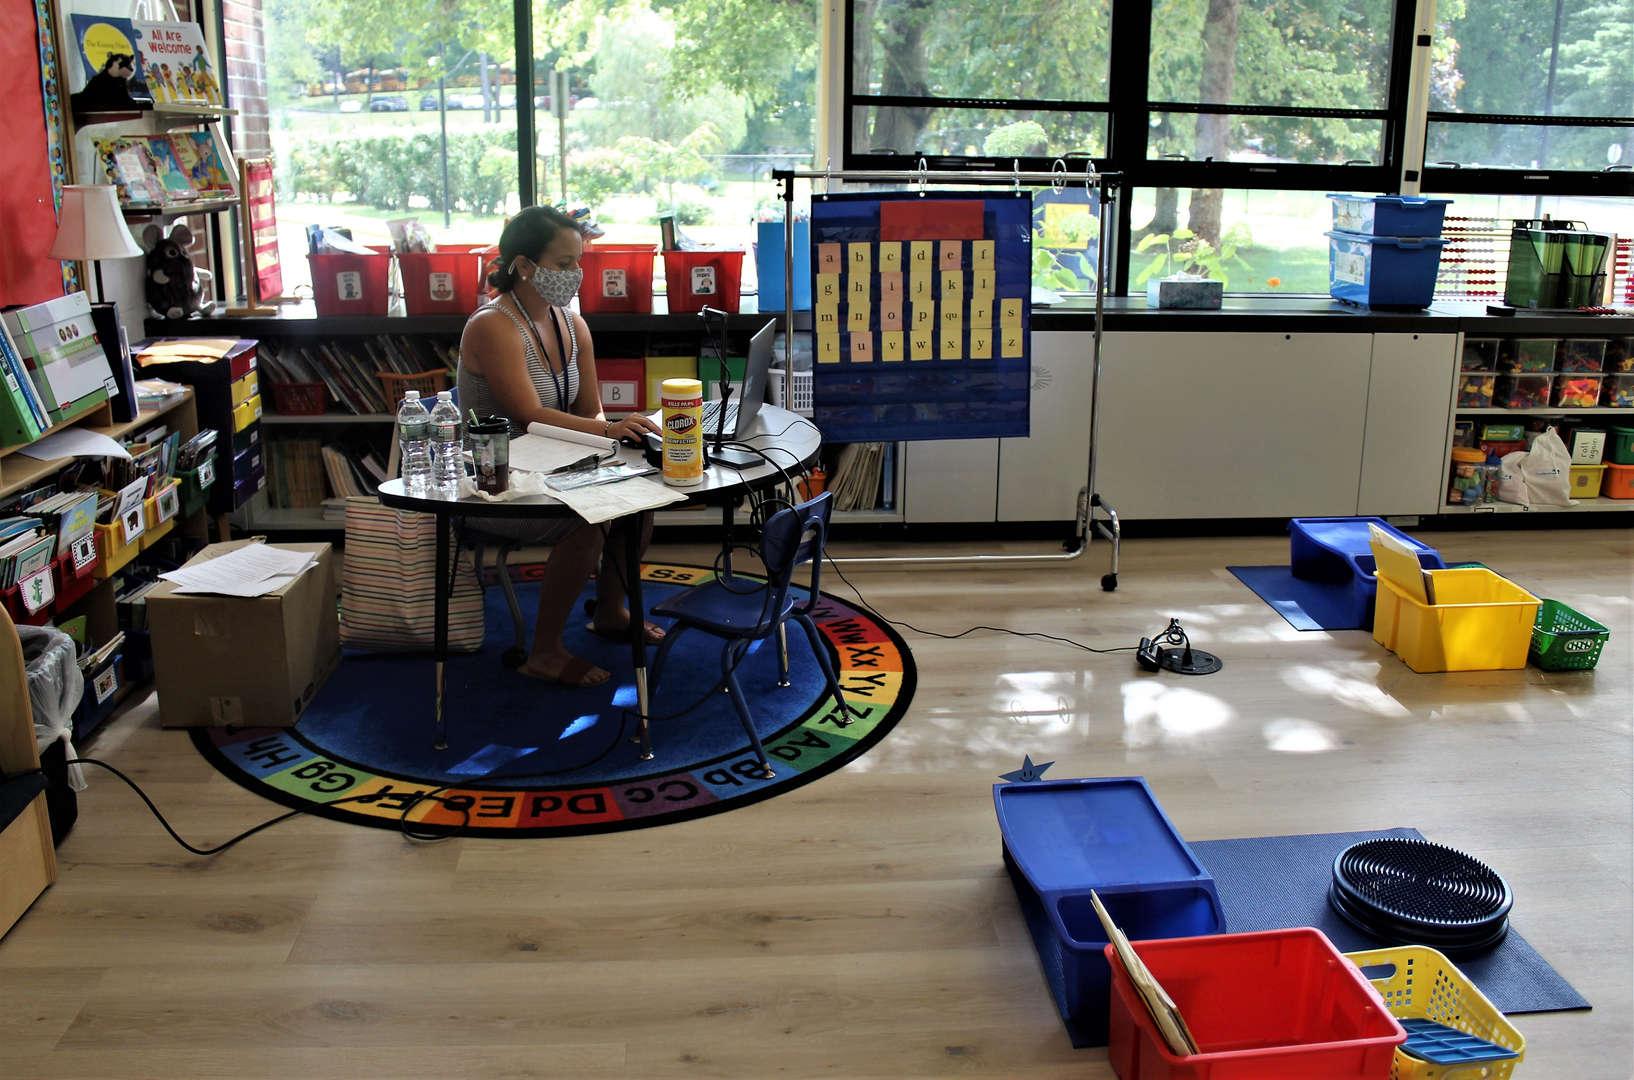 Kindergarten teacher Christina Povemba sets up her classroom for the year.